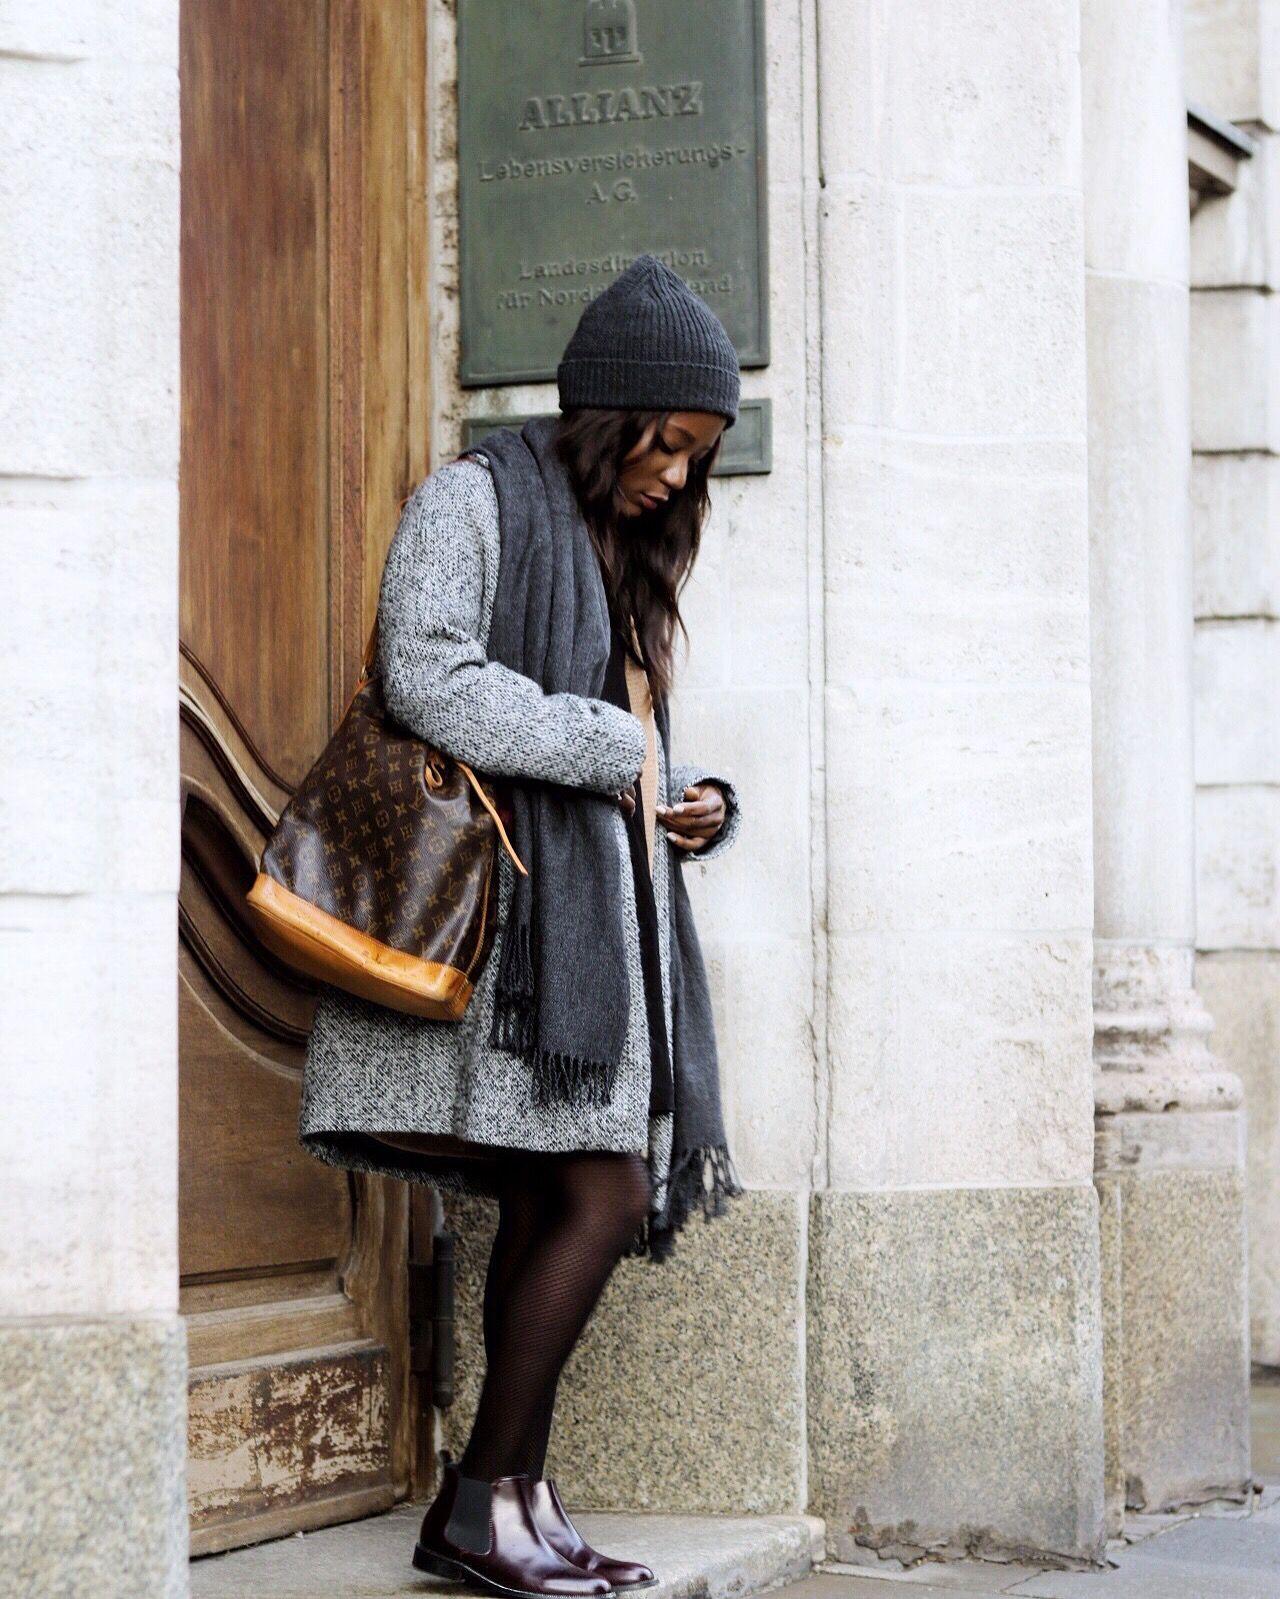 Louis Vuitton Sac Noe Lv Emmabrwn Vuitton Outfit Noe Louis Vuitton Fashion